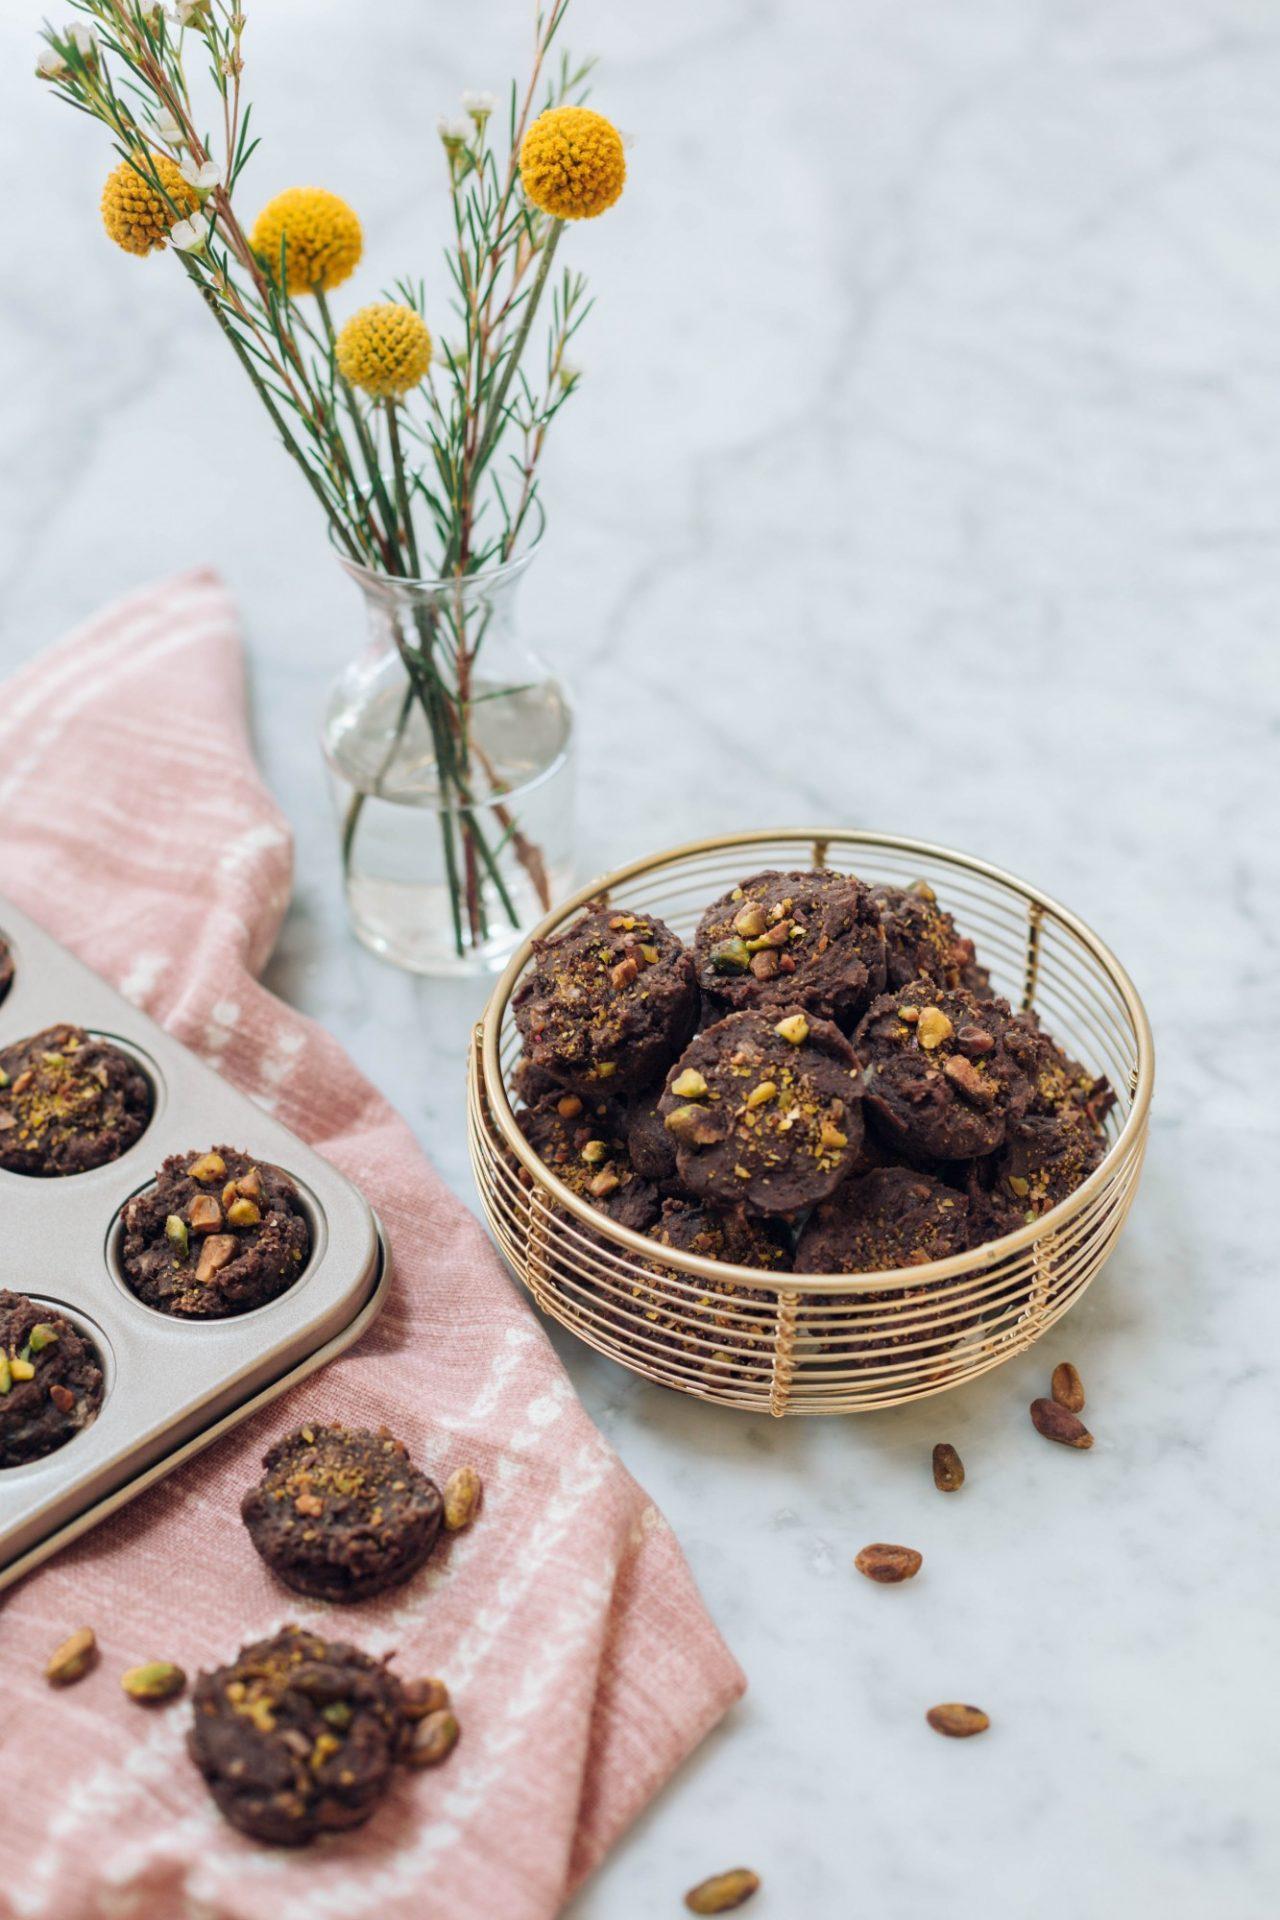 Peanut-ButterBanana-Chocolate-Mini-Muffins-06